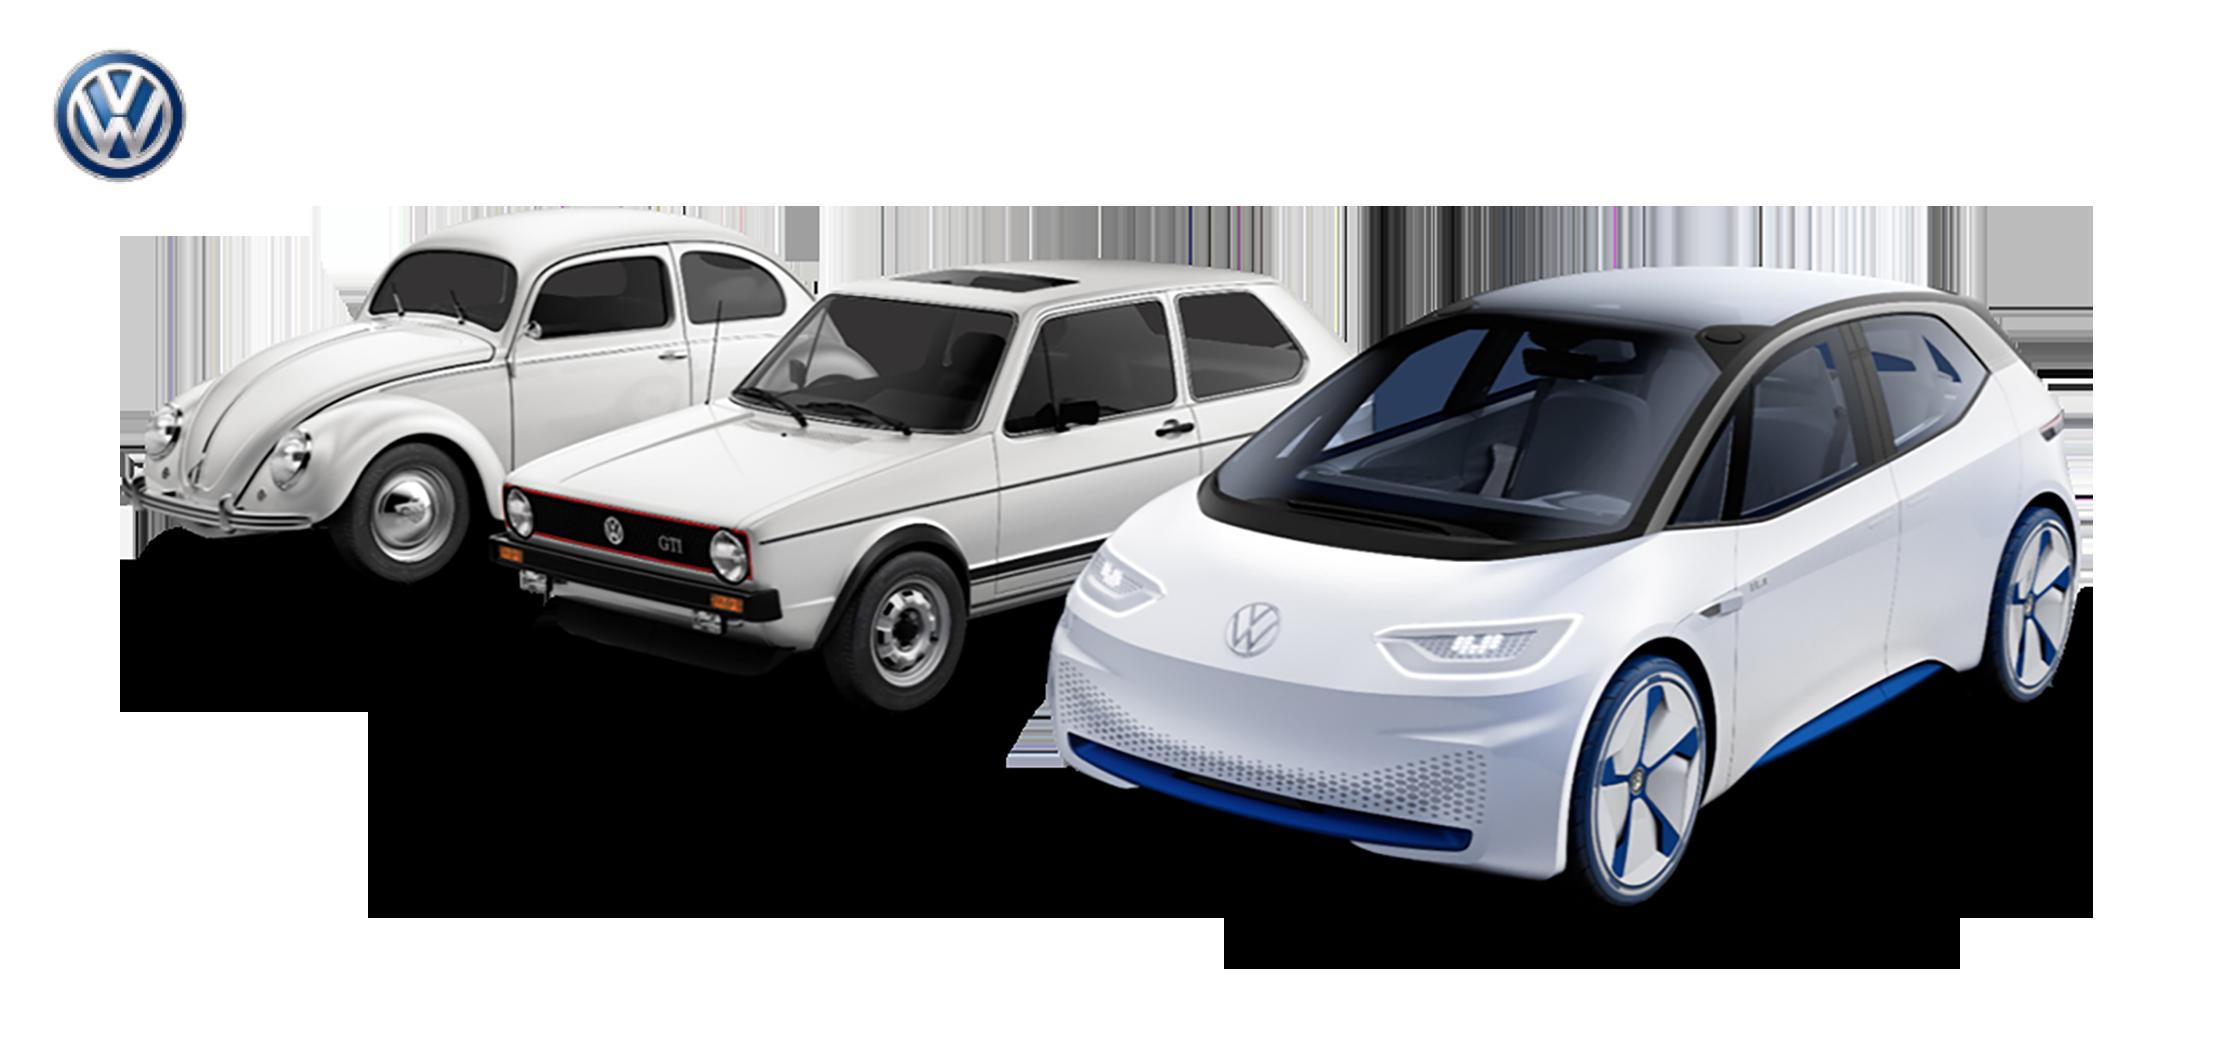 volkwagen-electric-car-golf